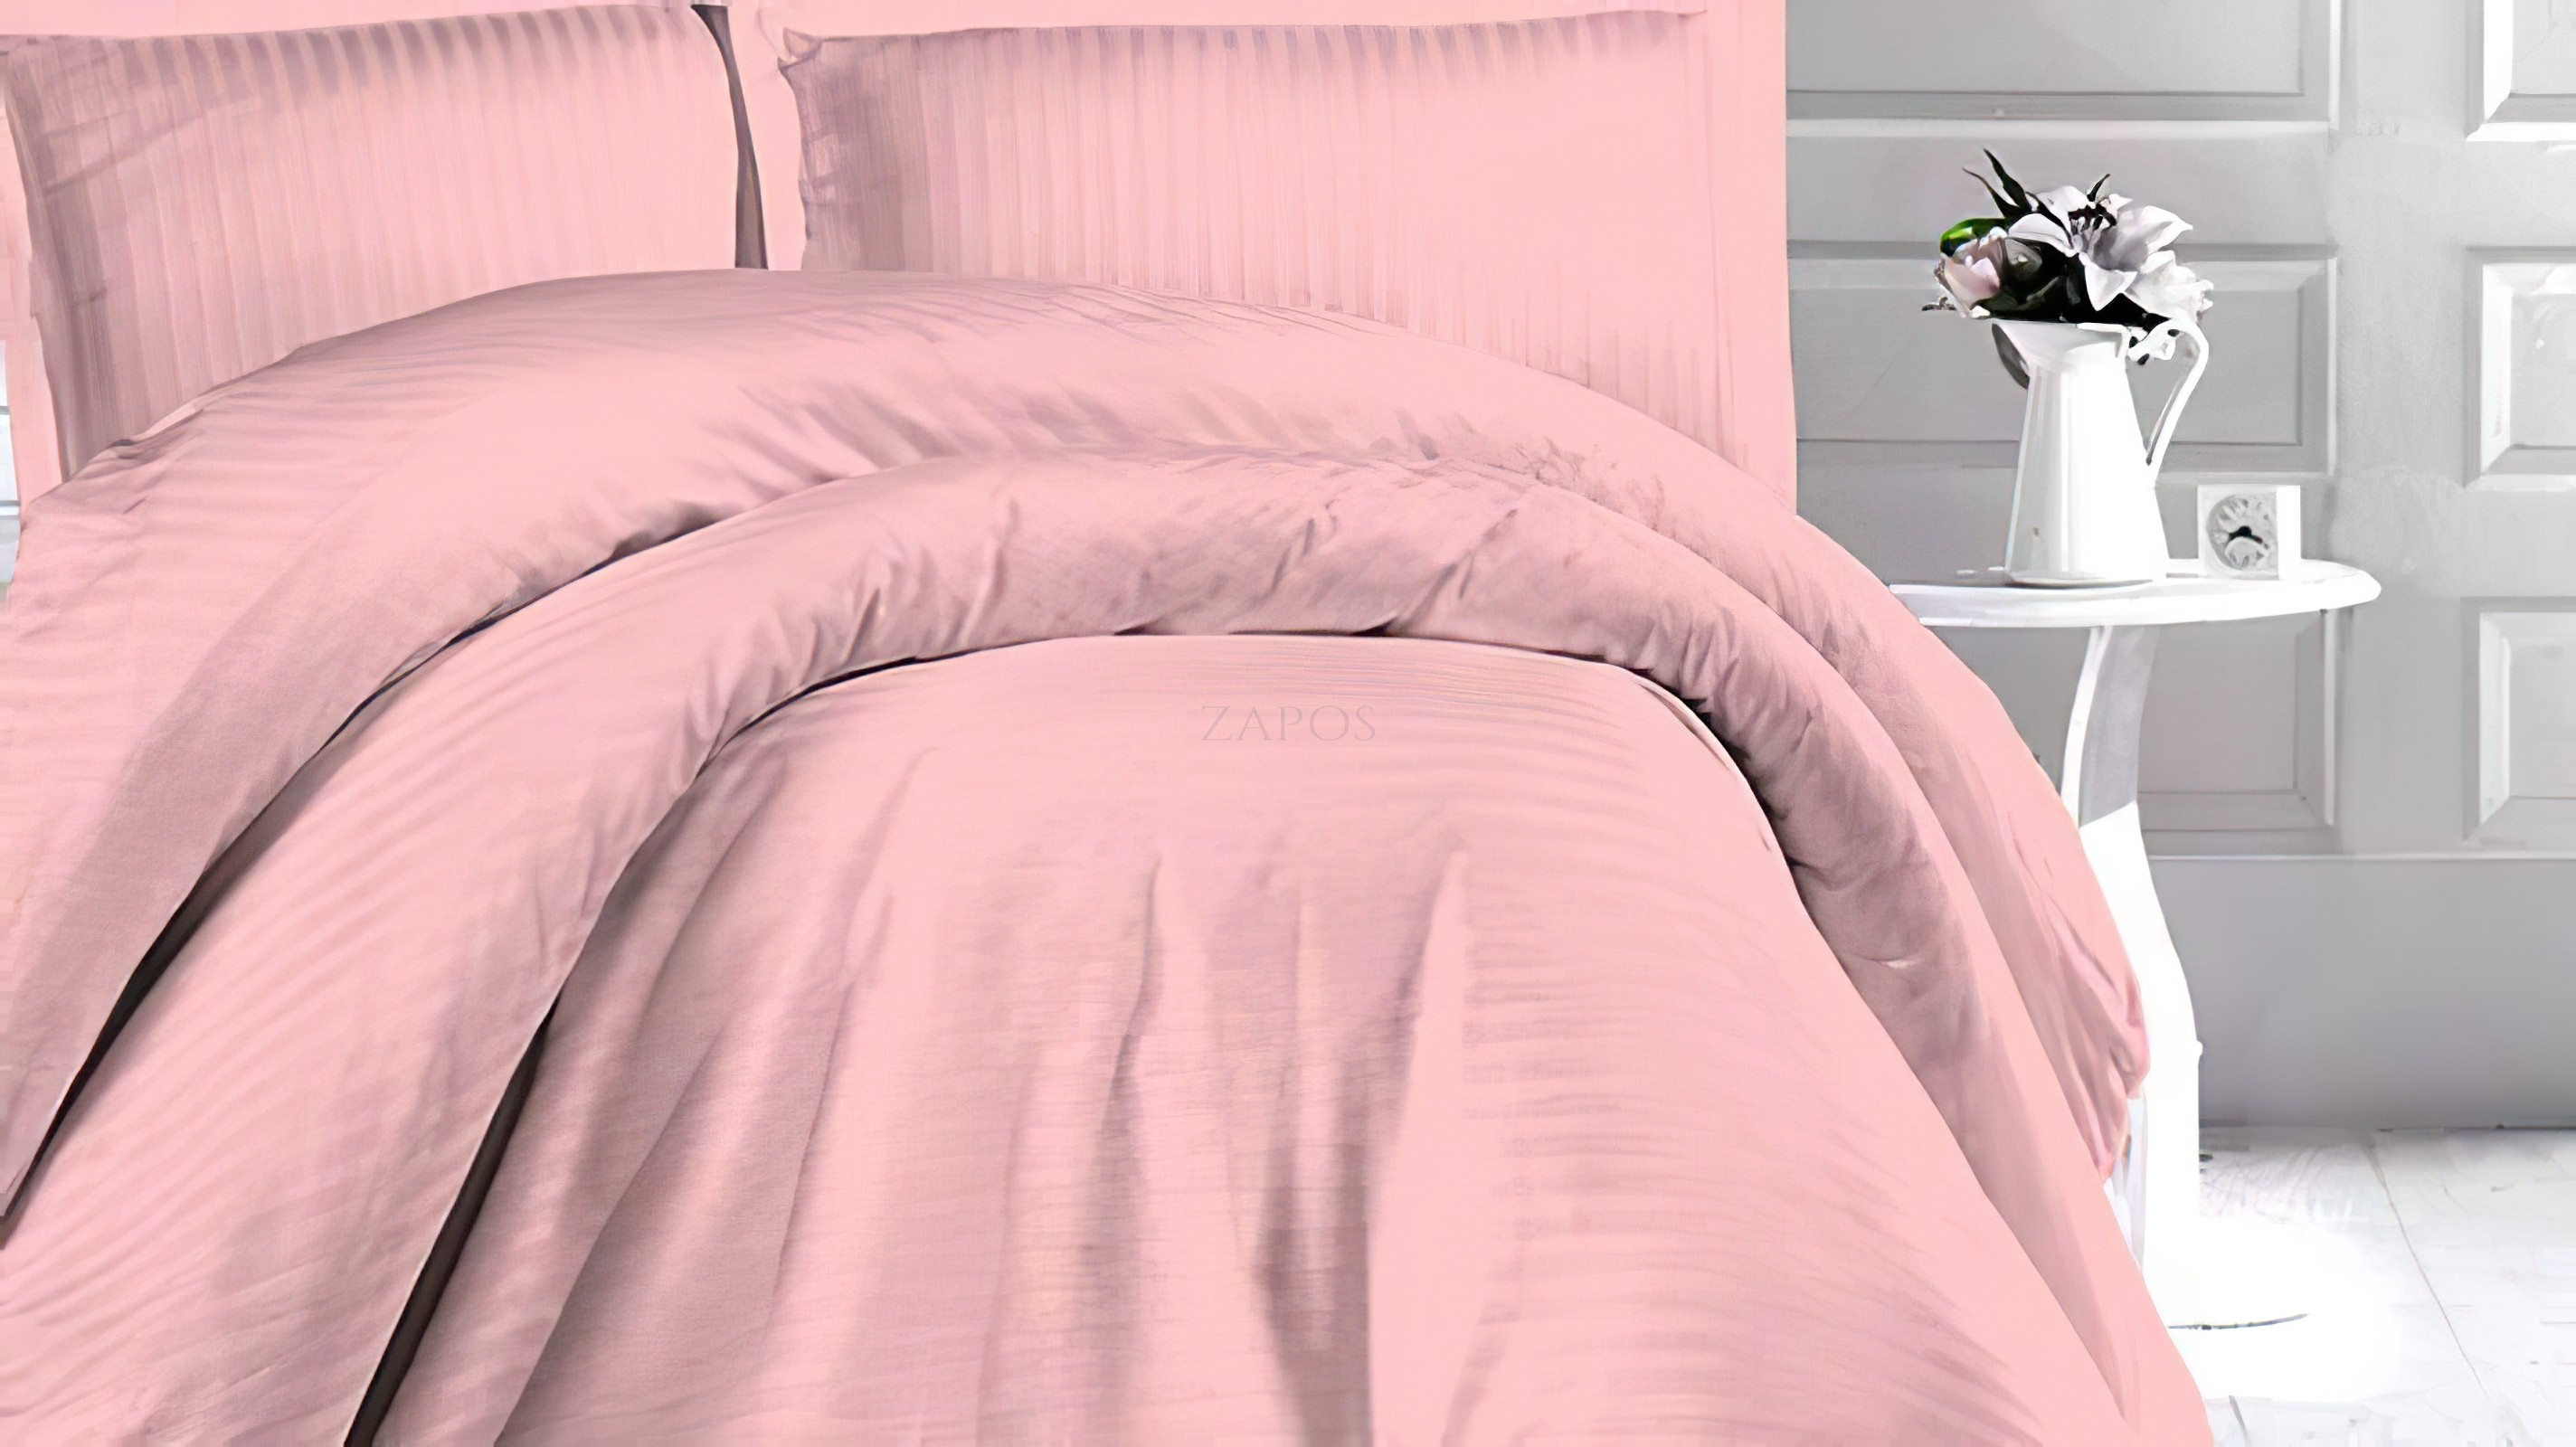 Lenjerie pat 1 persoana DAMASC SATIN - 3 piese - Roz pal, culoare uni